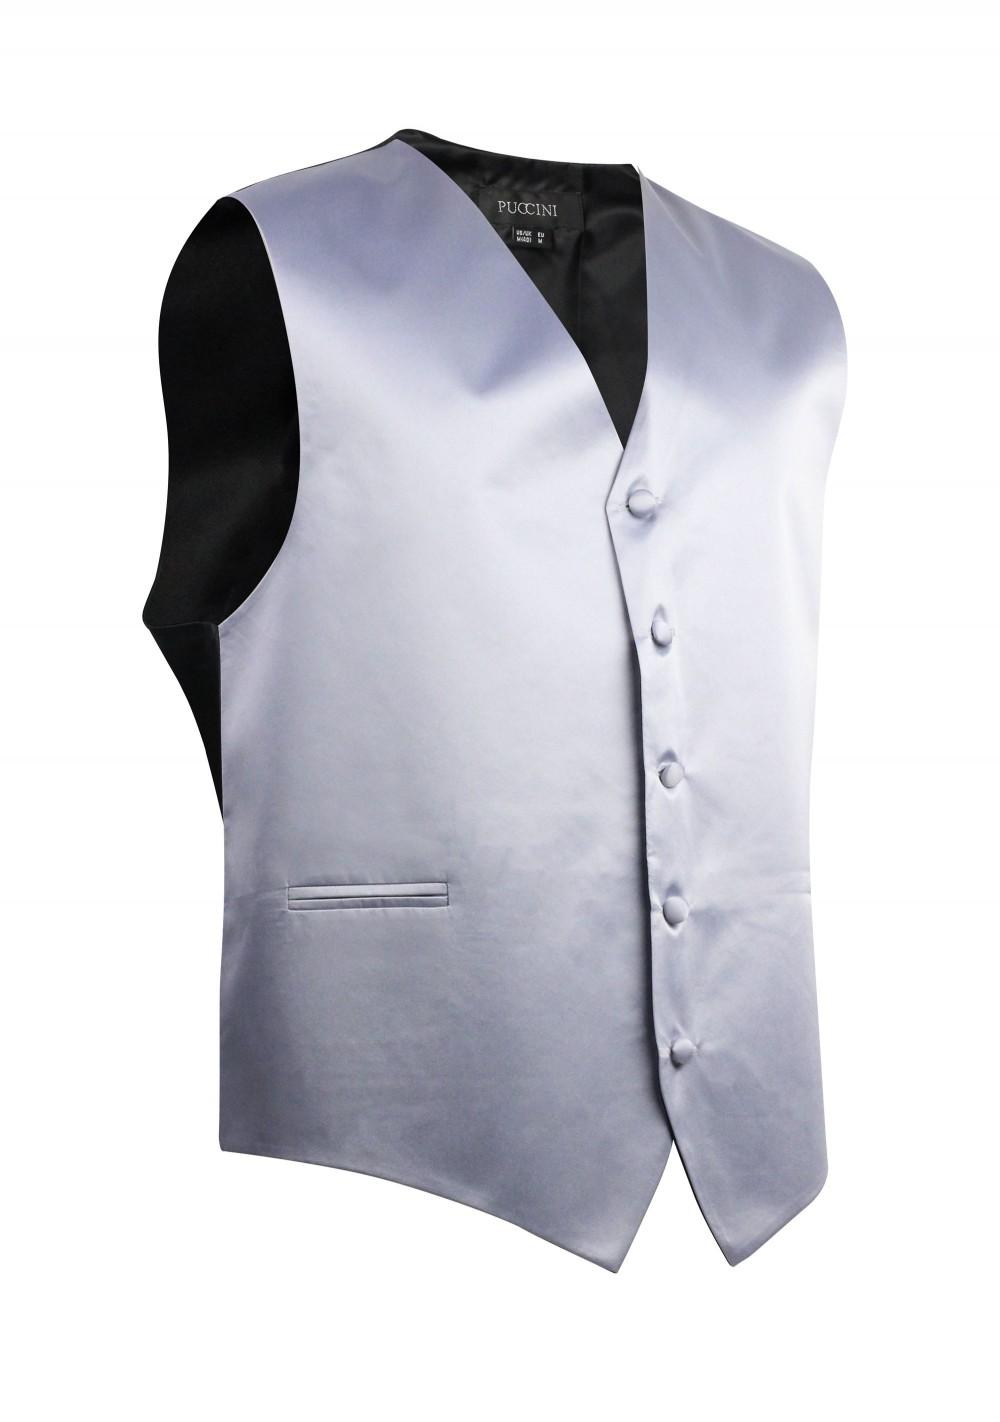 Silver Formal Satin Kids Vest